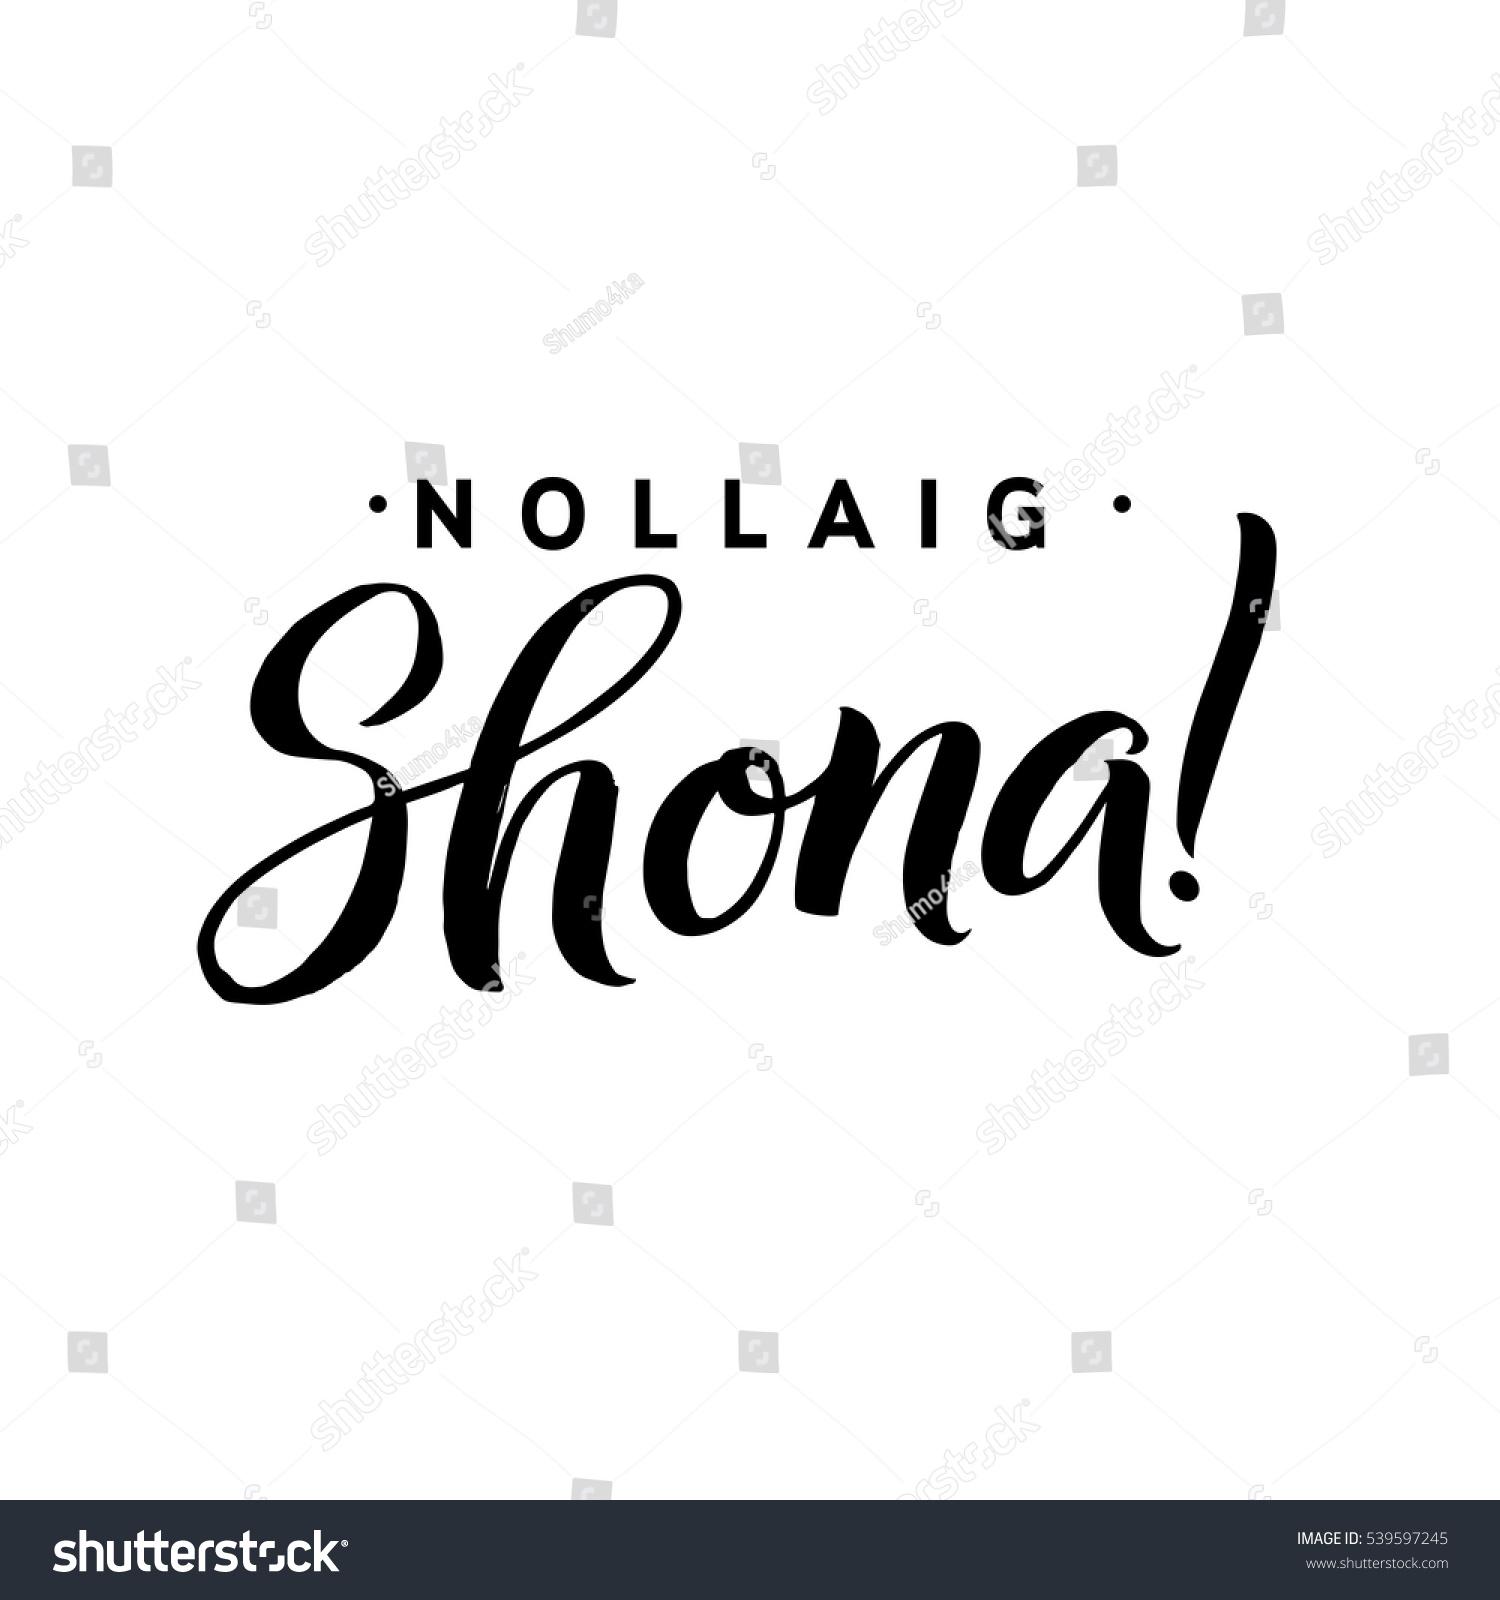 Nollaig Shona Merry Christmas Calligraphy Template เวกเตอร์สต็อก ...